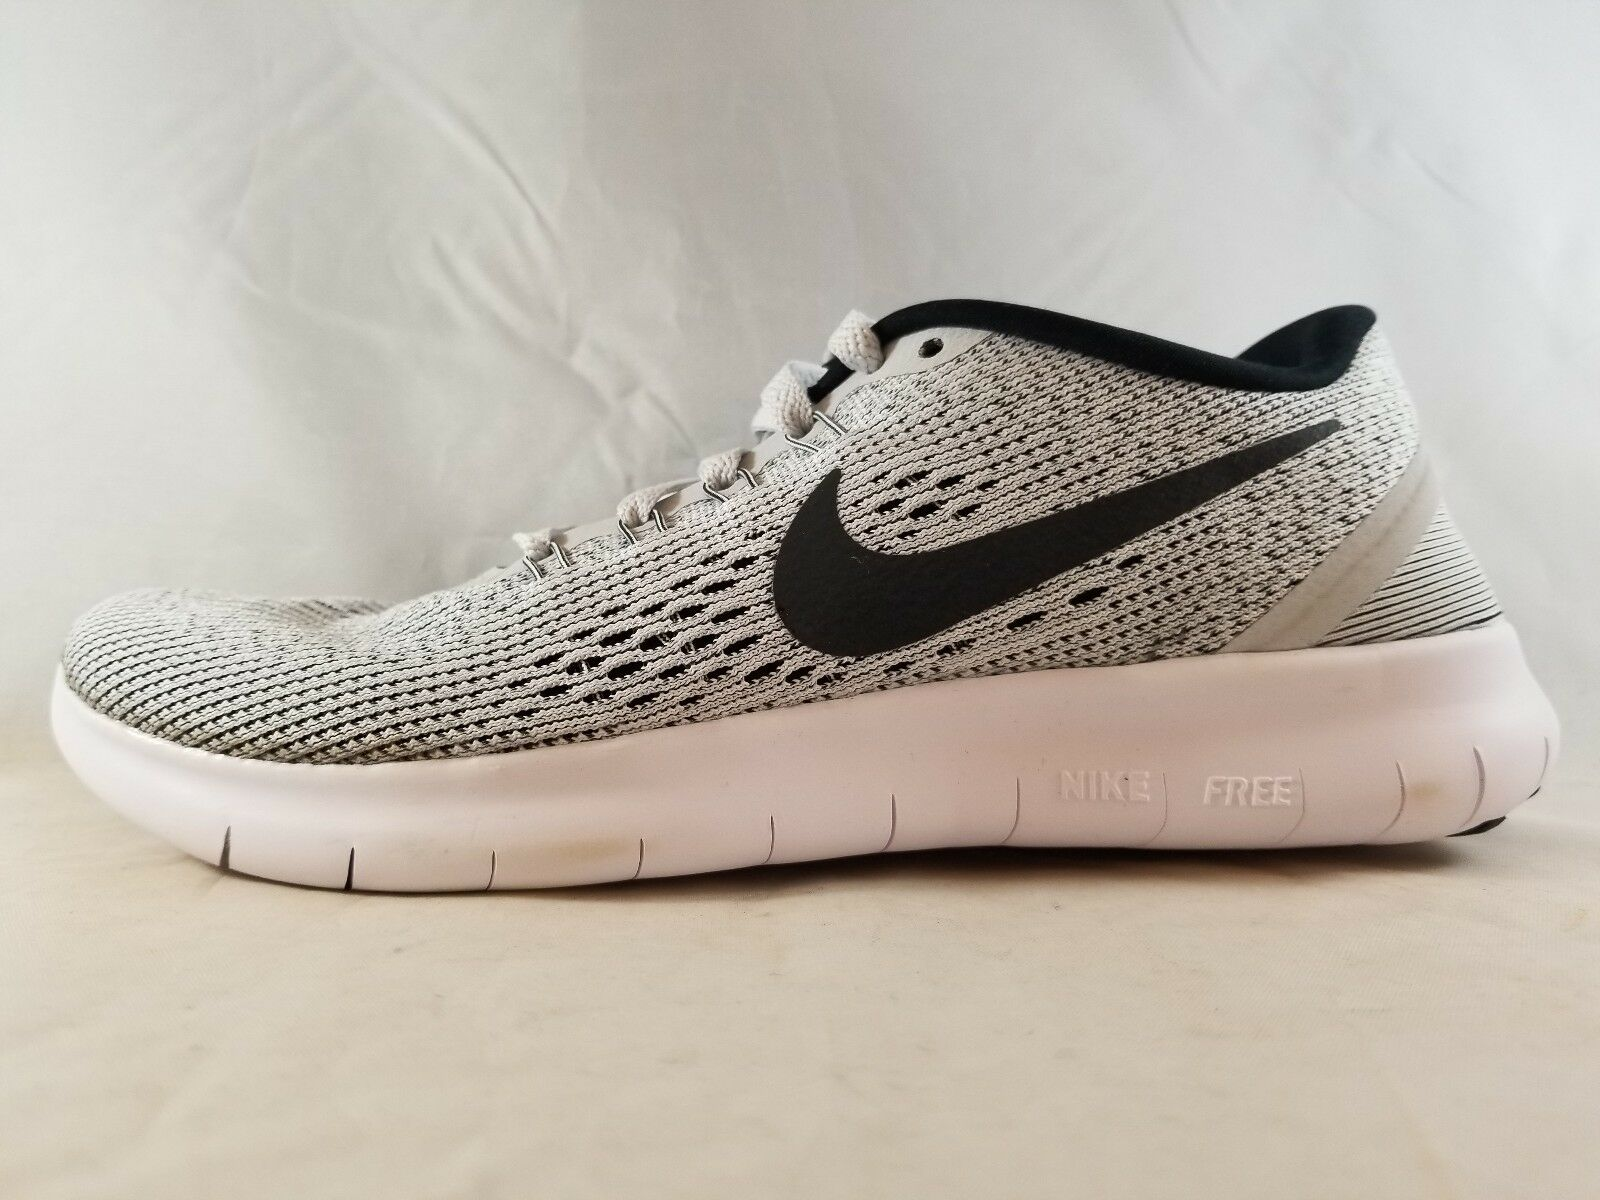 Nike Free RN Women's Running shoes 831509 831509 831509 101 Size 5 951c1d